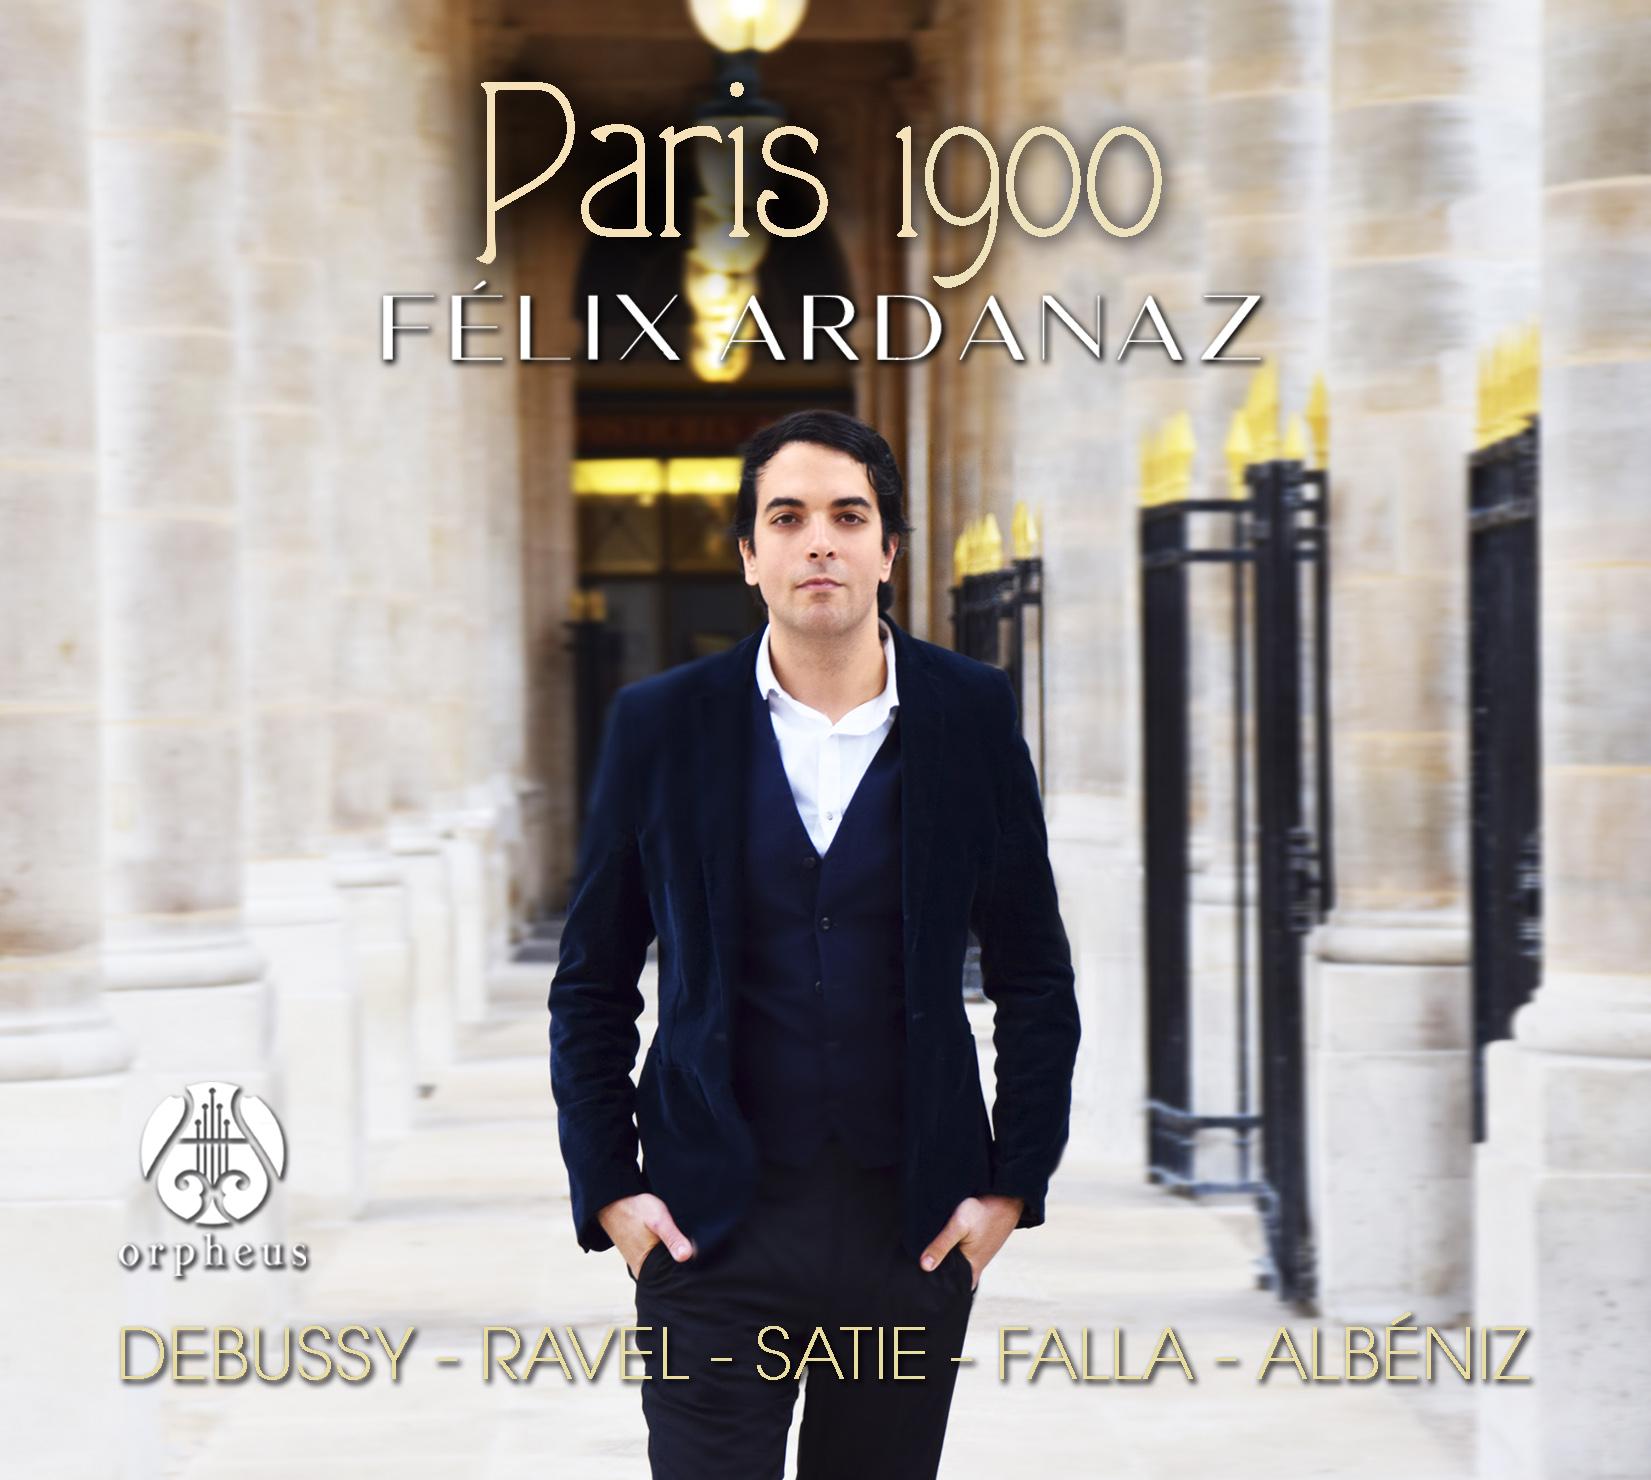 Félix Ardanaz: CD París 1900